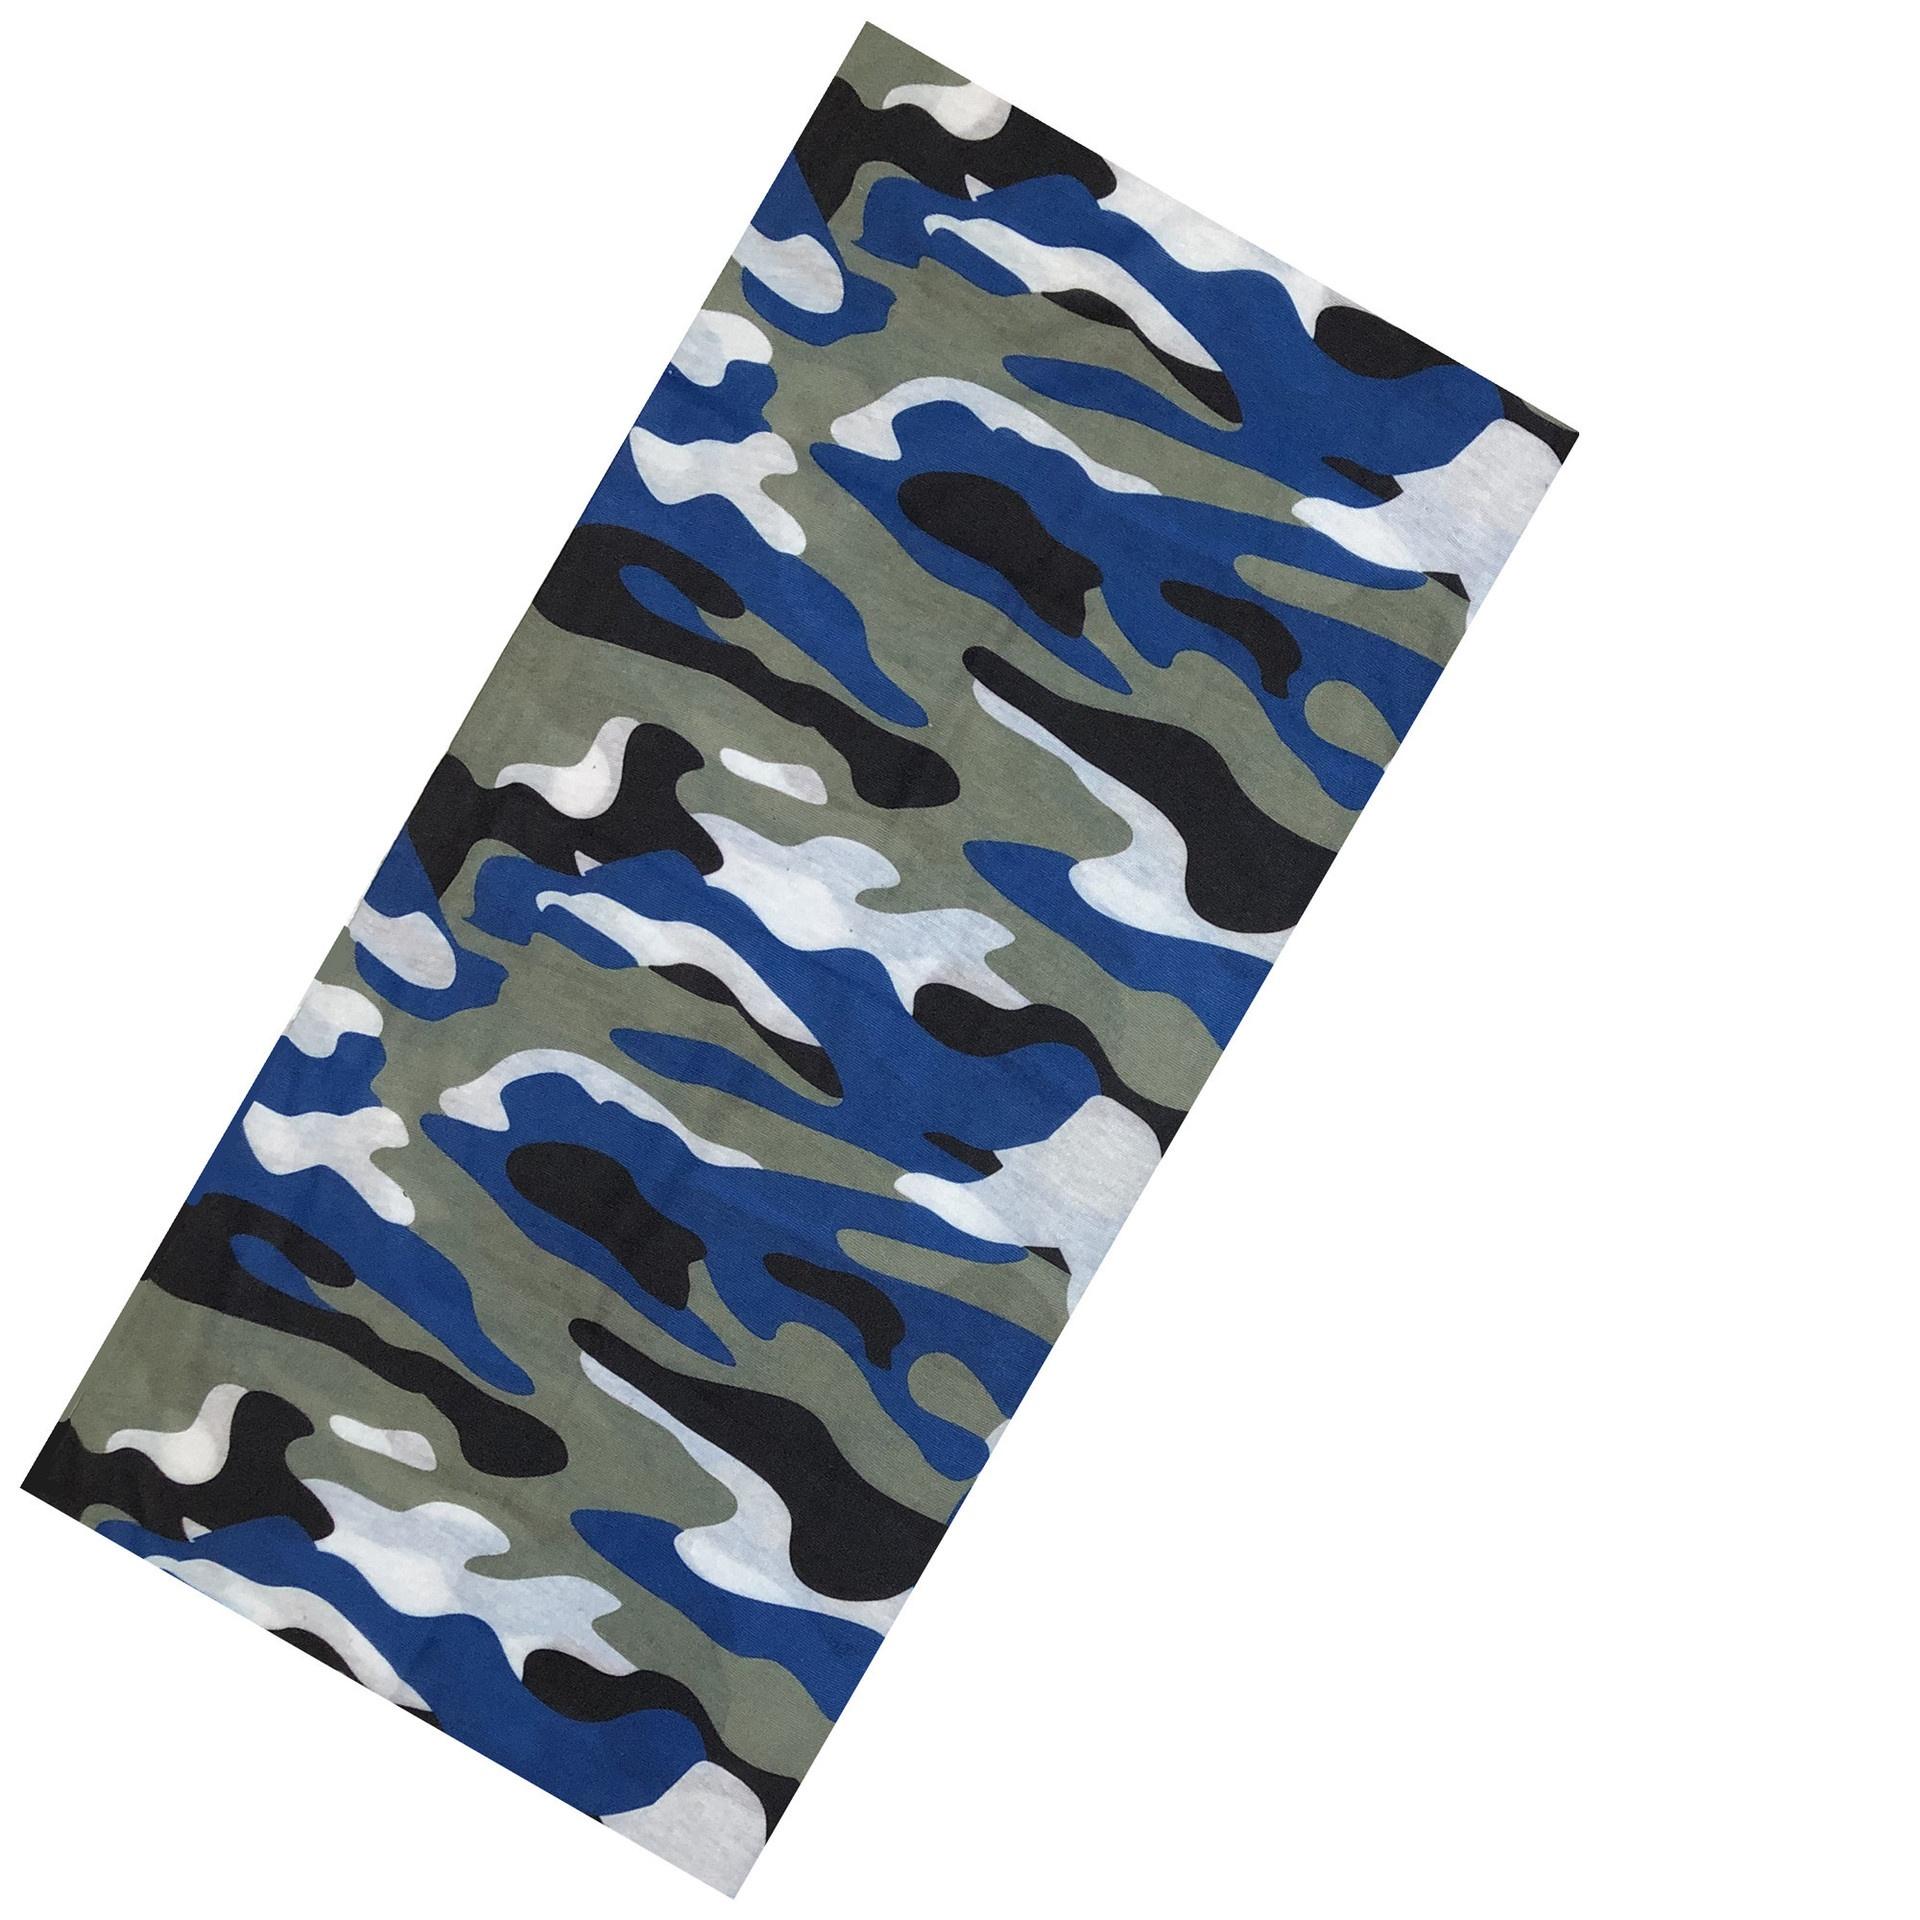 Custom-Multifunctional-Sports-Elastic-Headband-Seamless-Headband(1)